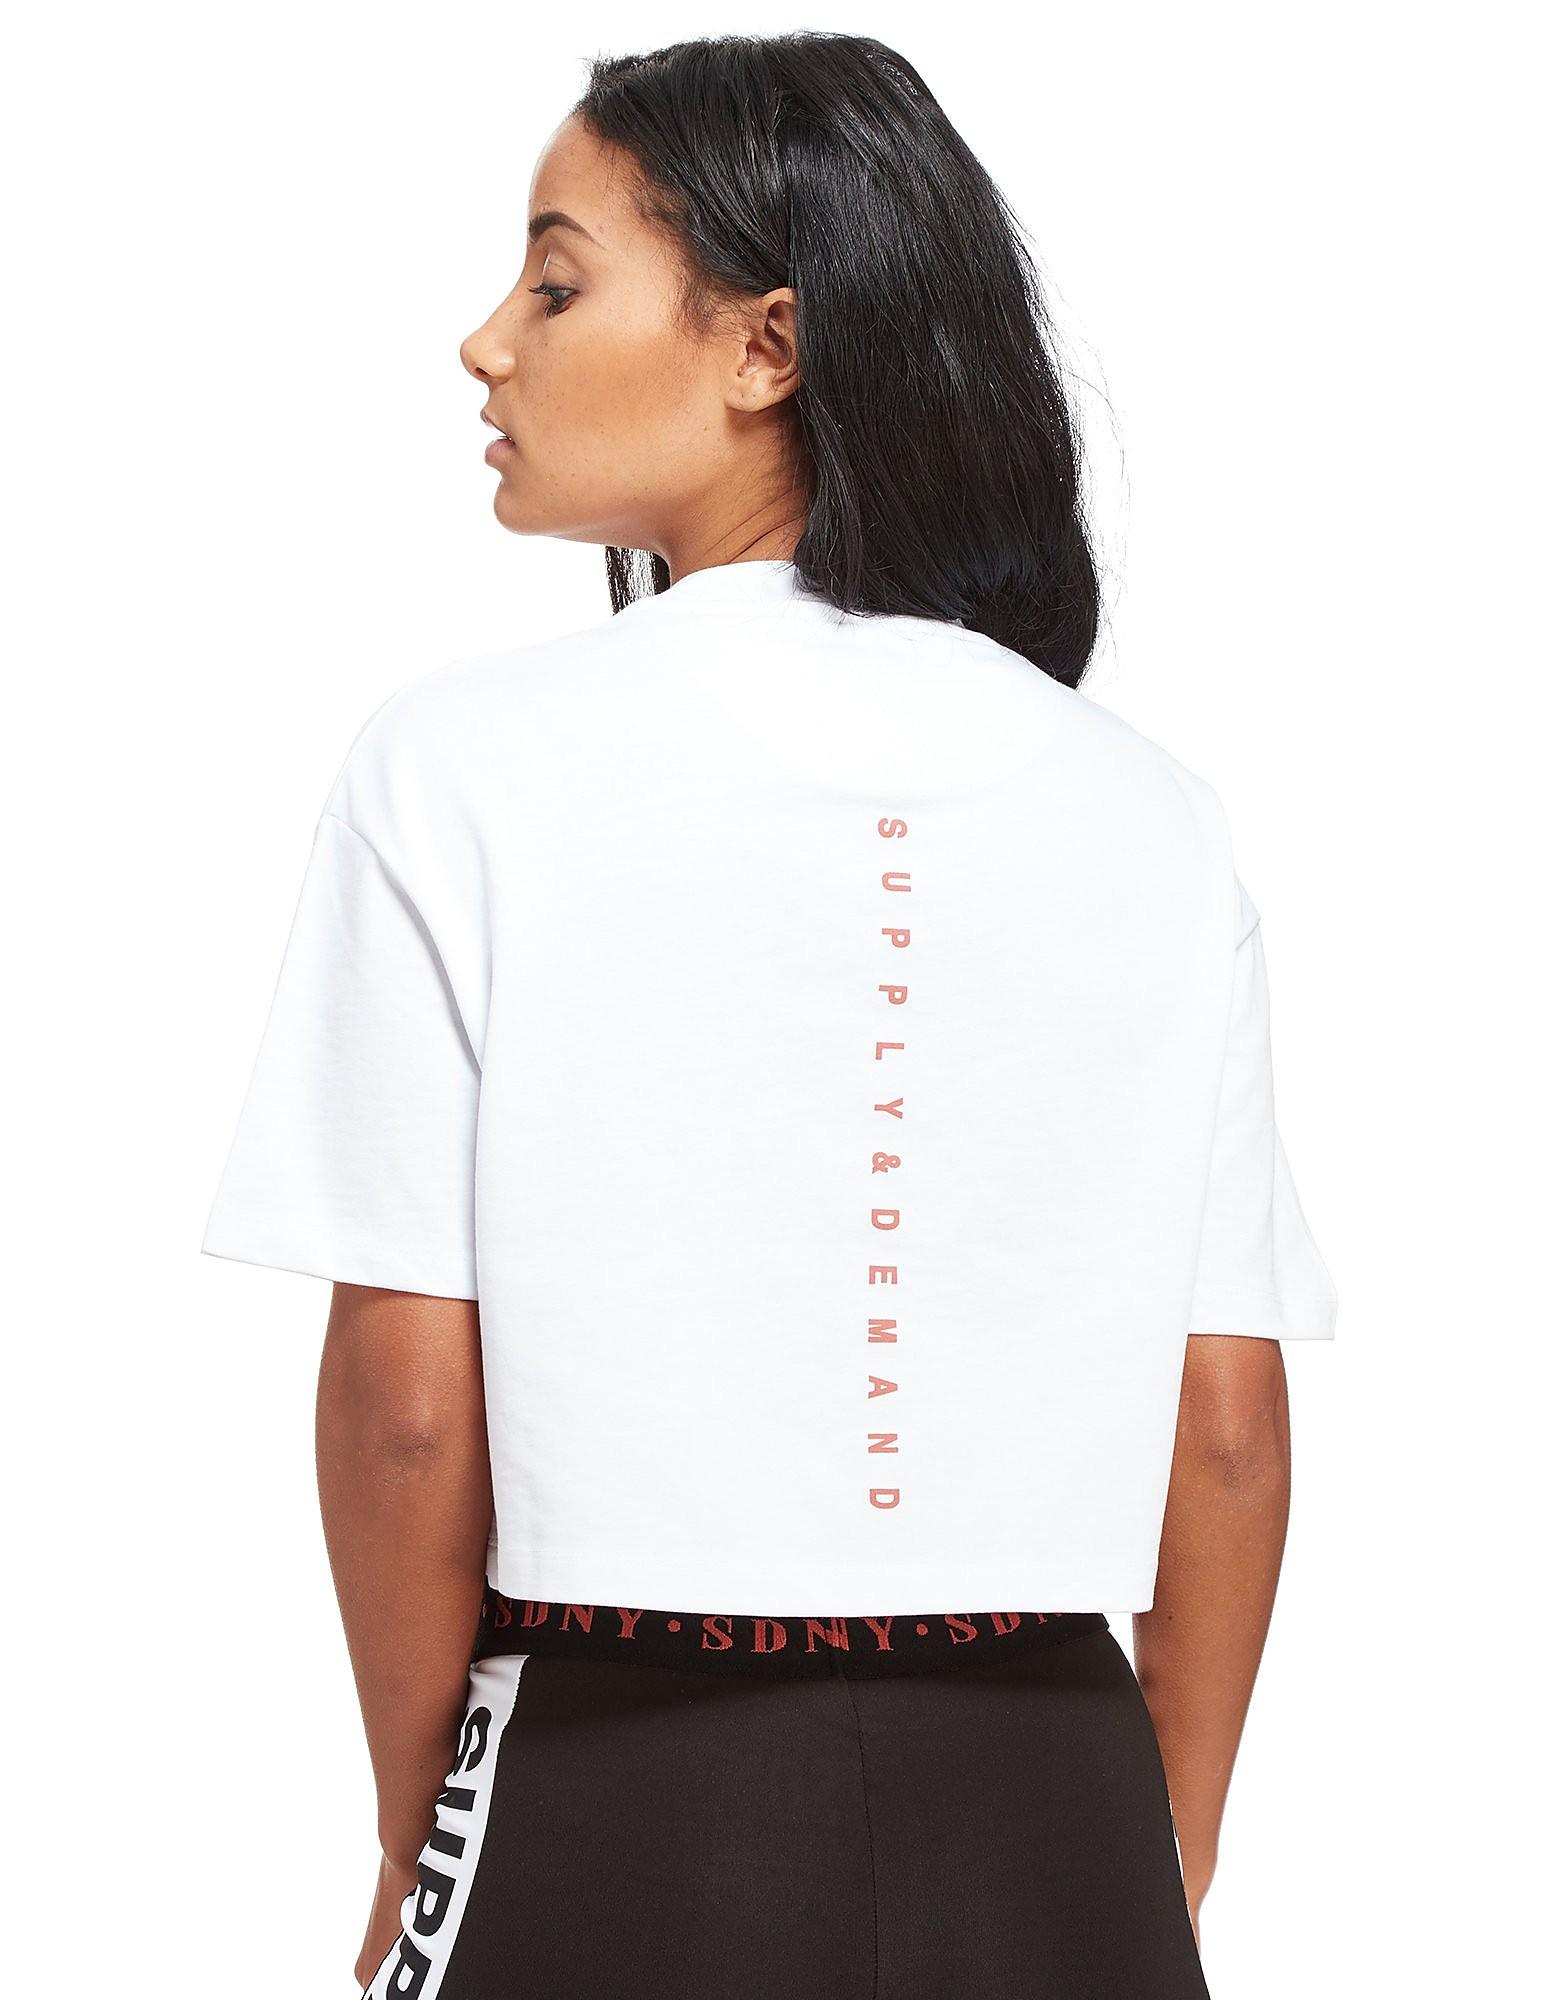 Supply & Demand Boxy Badge T-Shirt